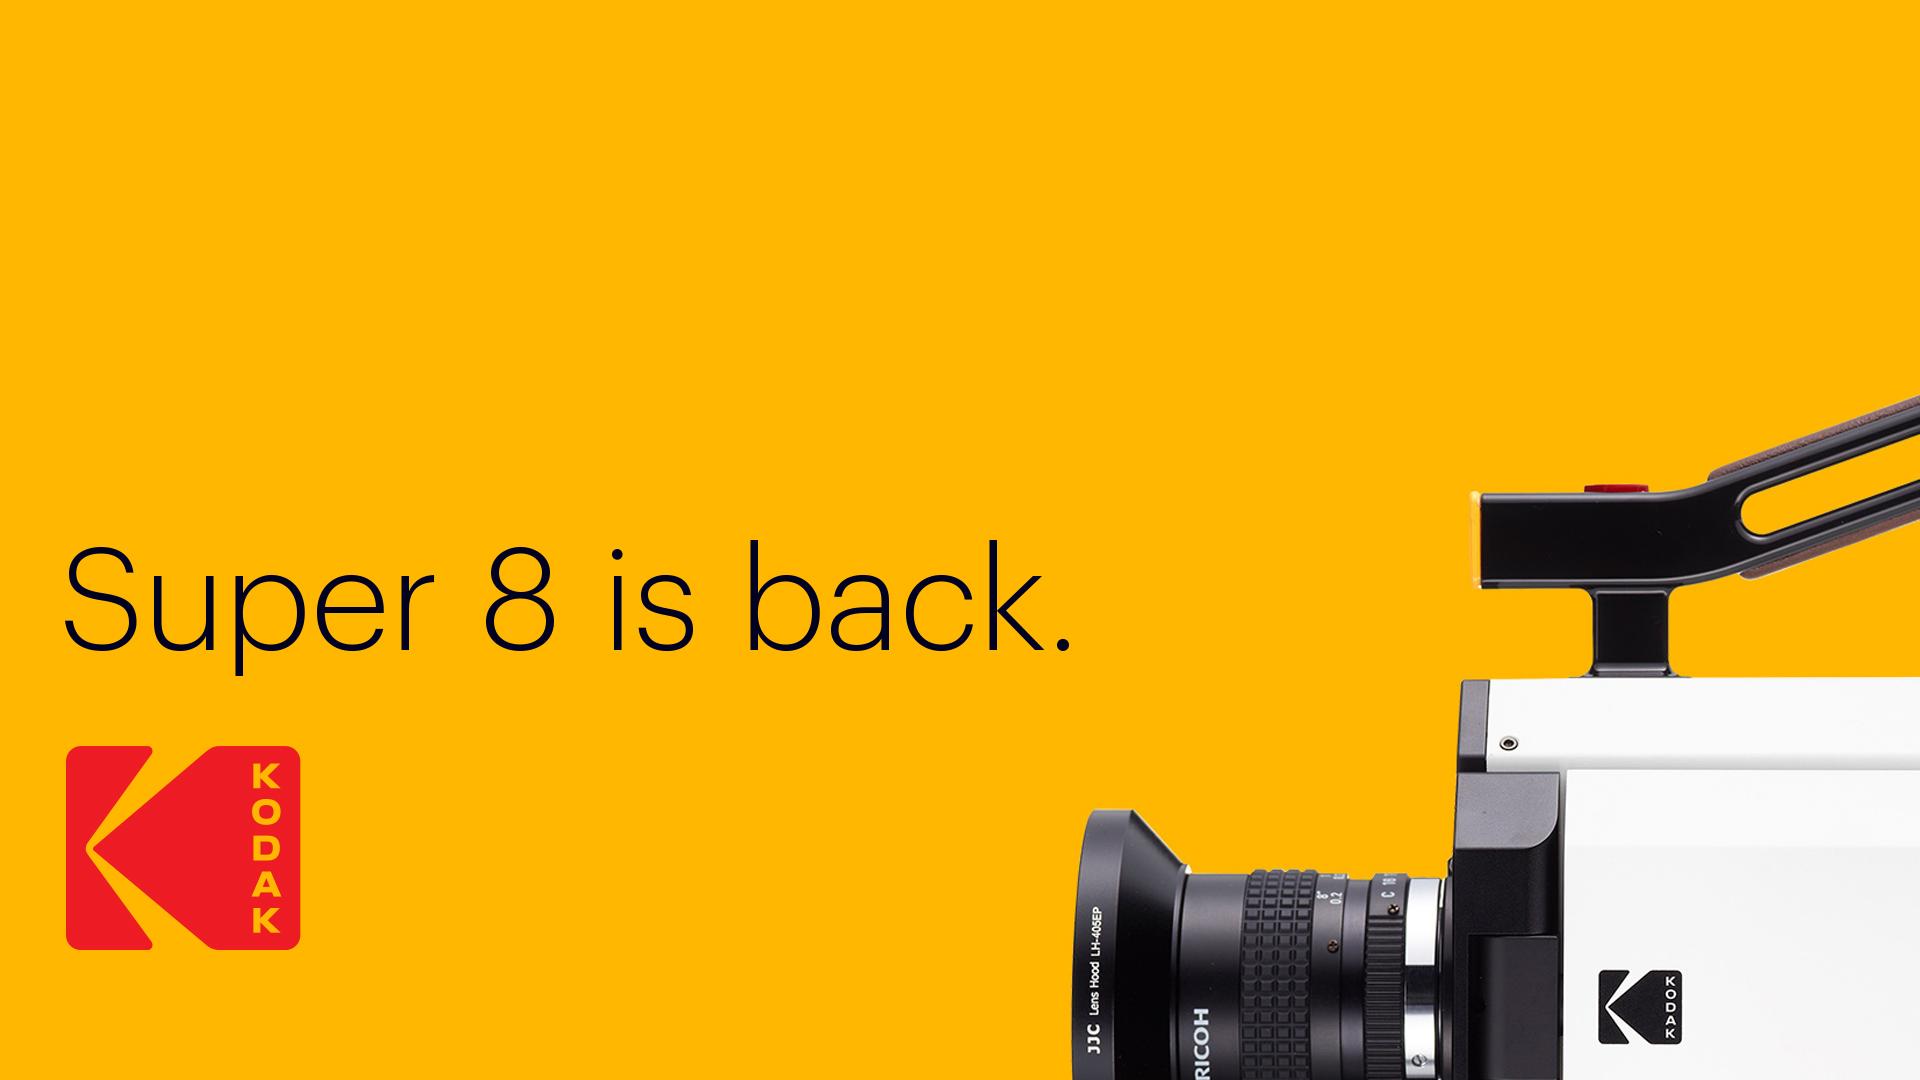 Kodak logo super 8 ad